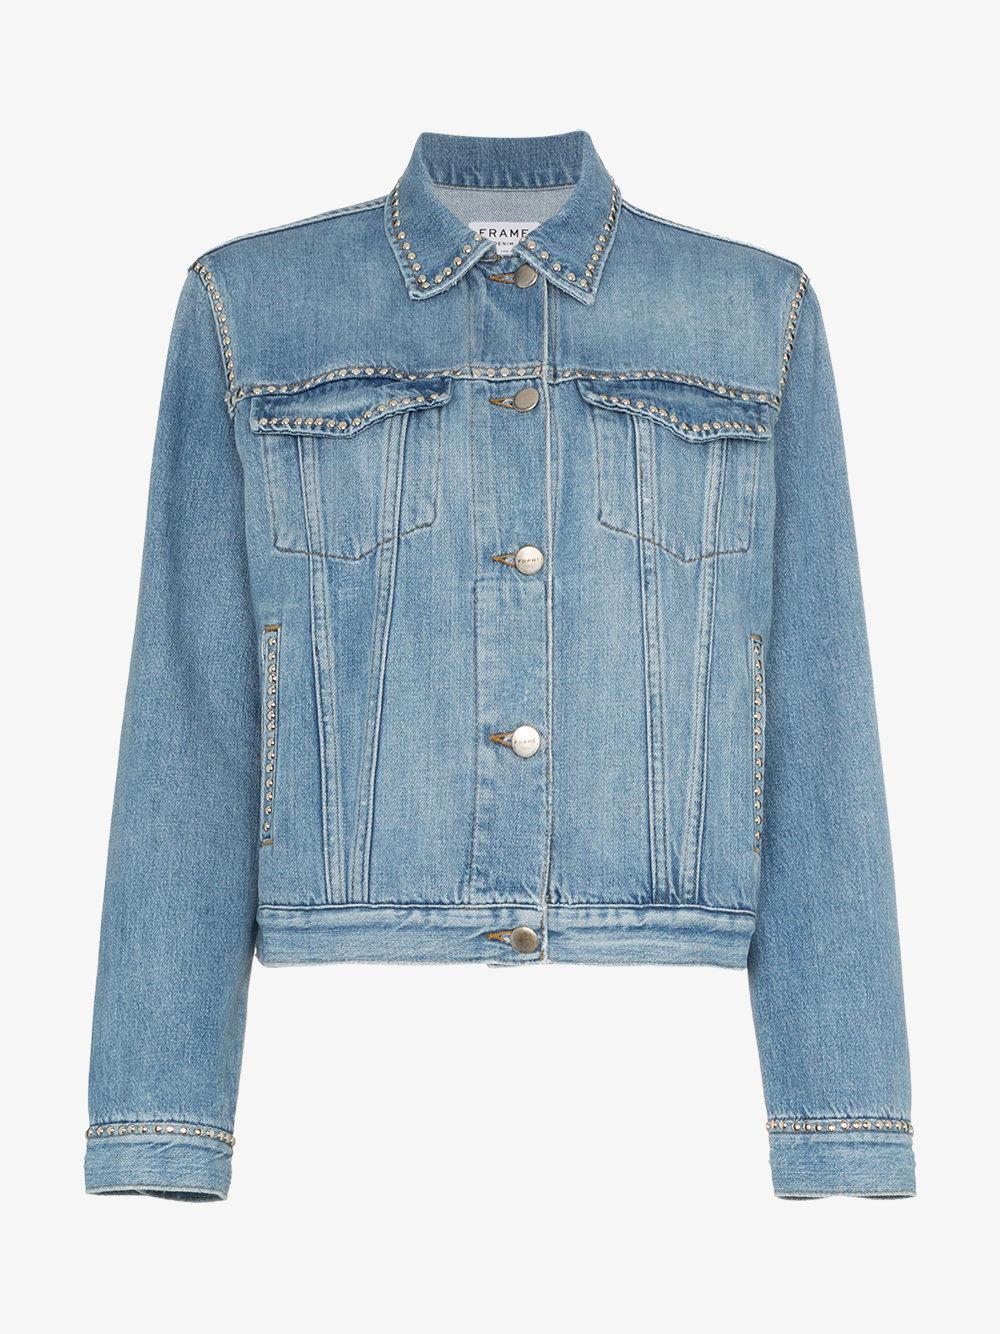 Discount Websites blue long sleeve denim jacket Frame Denim Cheap Huge Surprise Best Store To Get Online Cheap Sale Low Shipping ENoHAcK